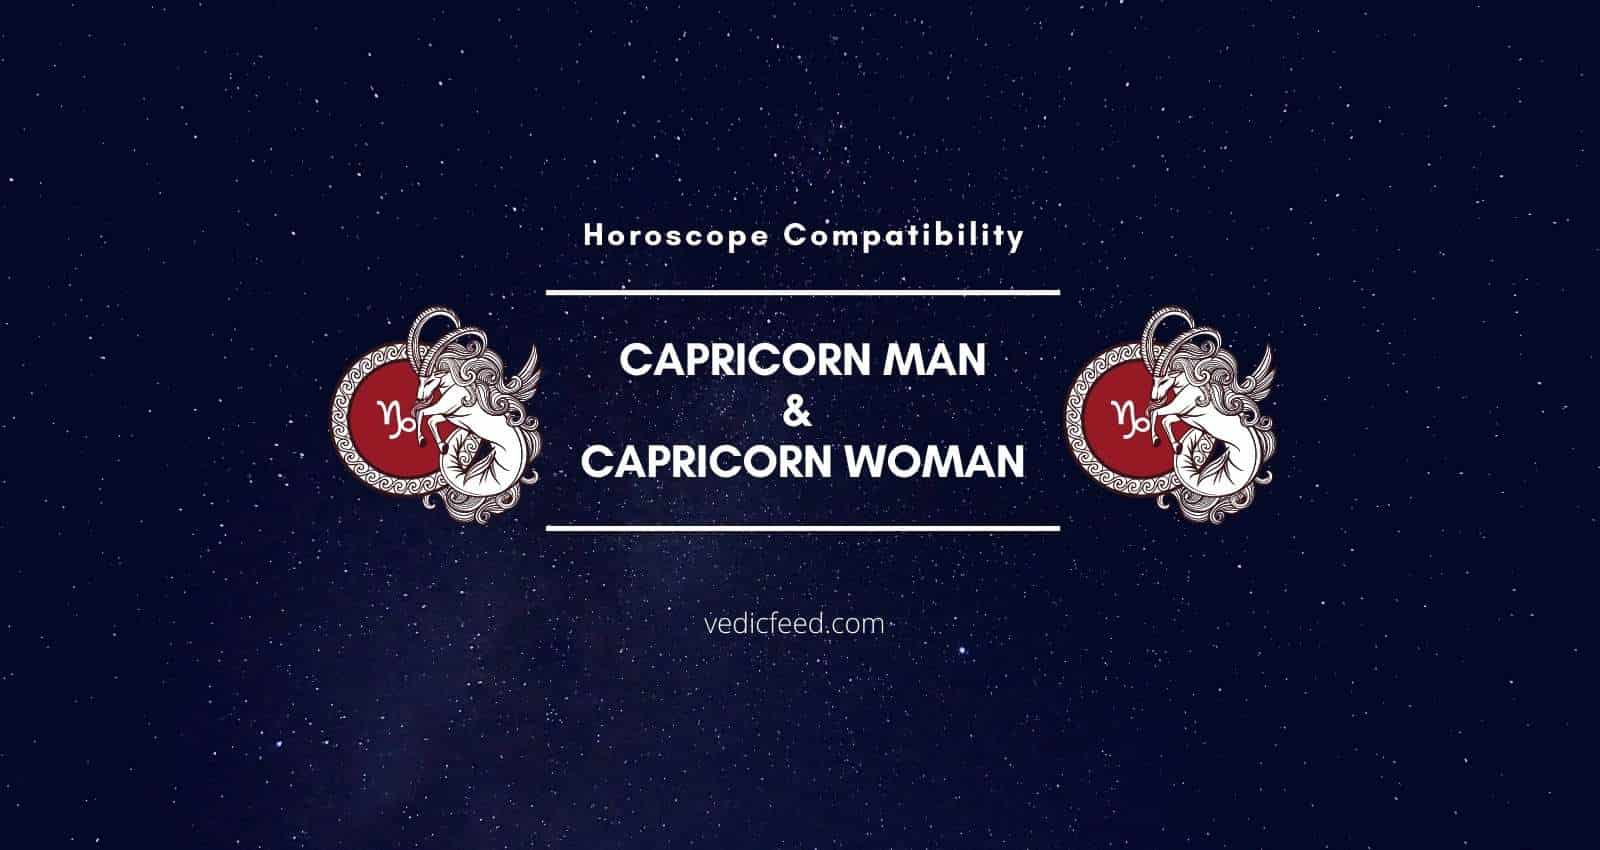 Capricorn Man and Capricorn Woman Compatibility